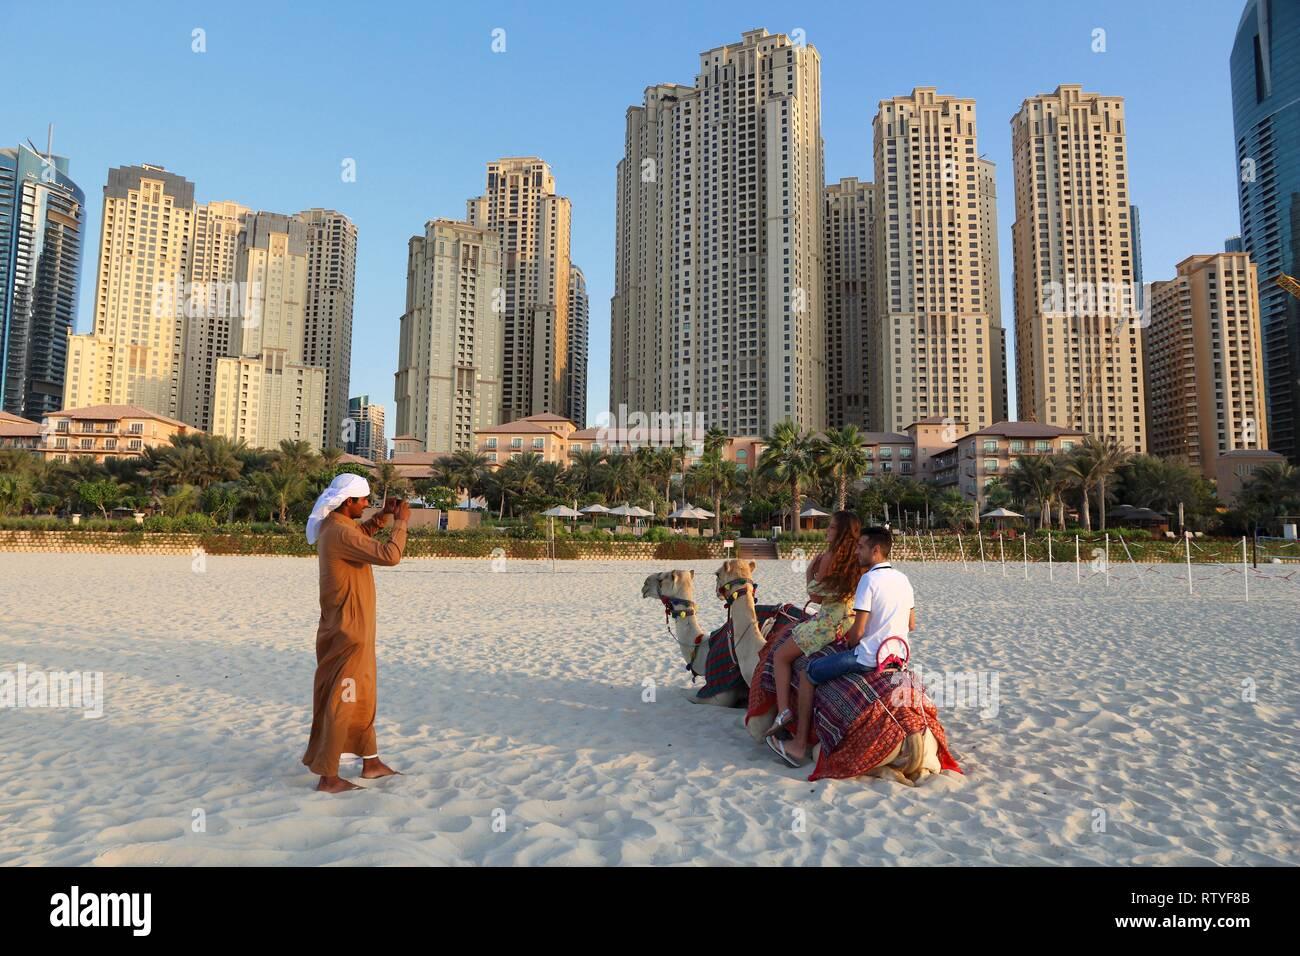 DUBAI, UAE - NOVEMBER 23, 2017: Tourists ride camels in front of Jumeirah Beach Residence in Dubai, United Arab Emirates. Dubai has 14.9 million annua - Stock Image